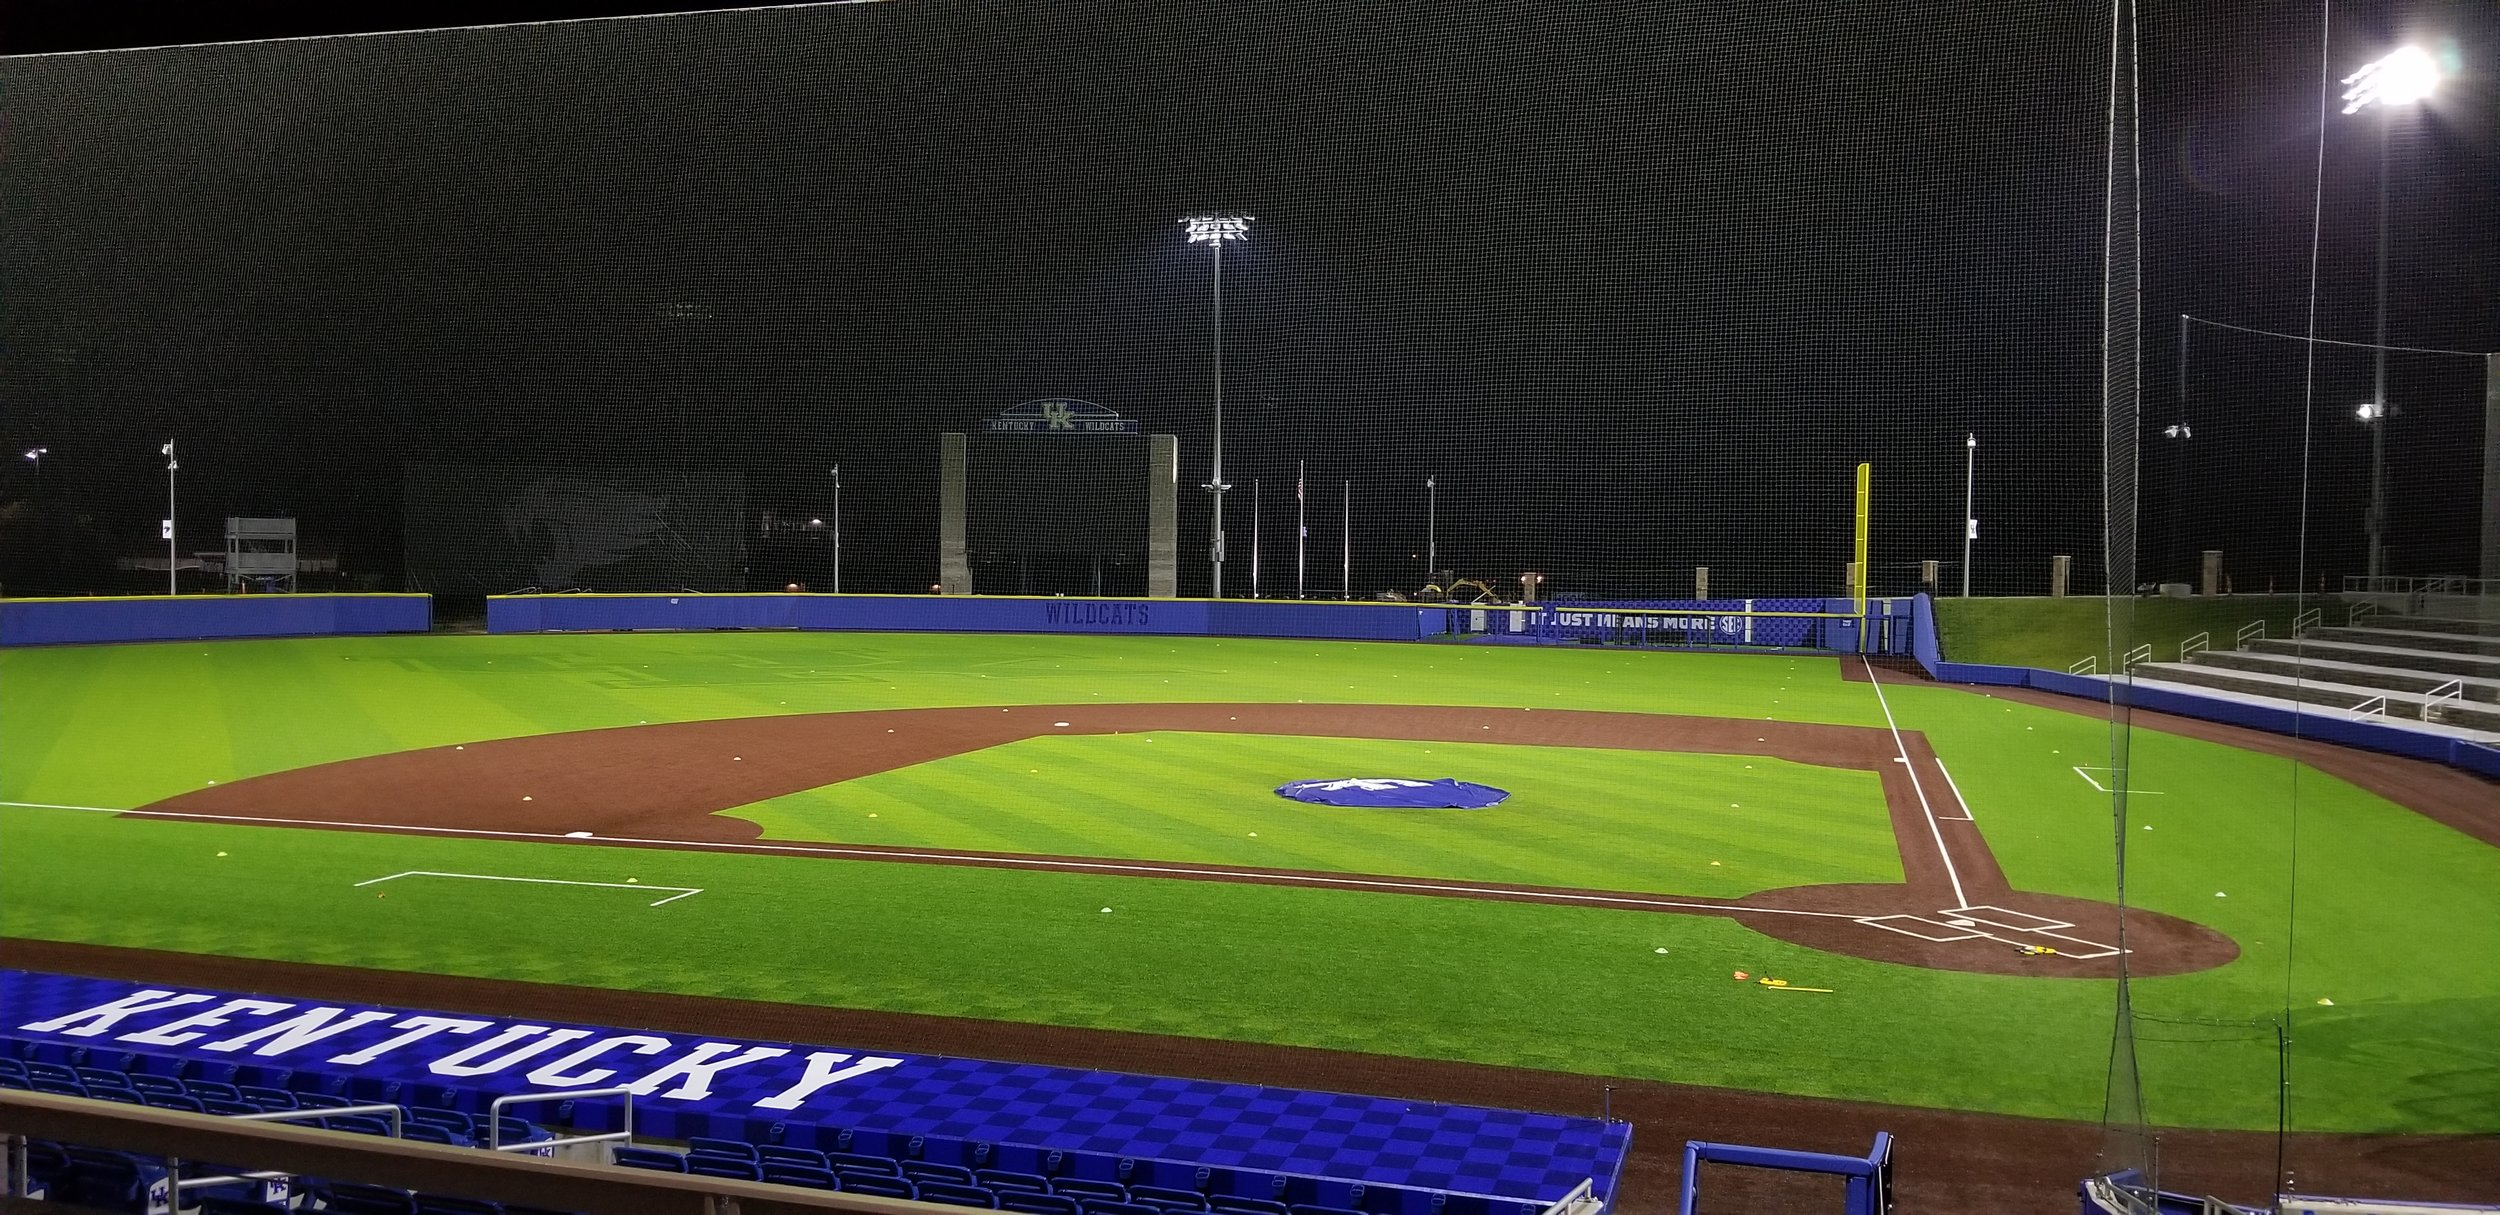 University of Kentucky - Baseball Stadium